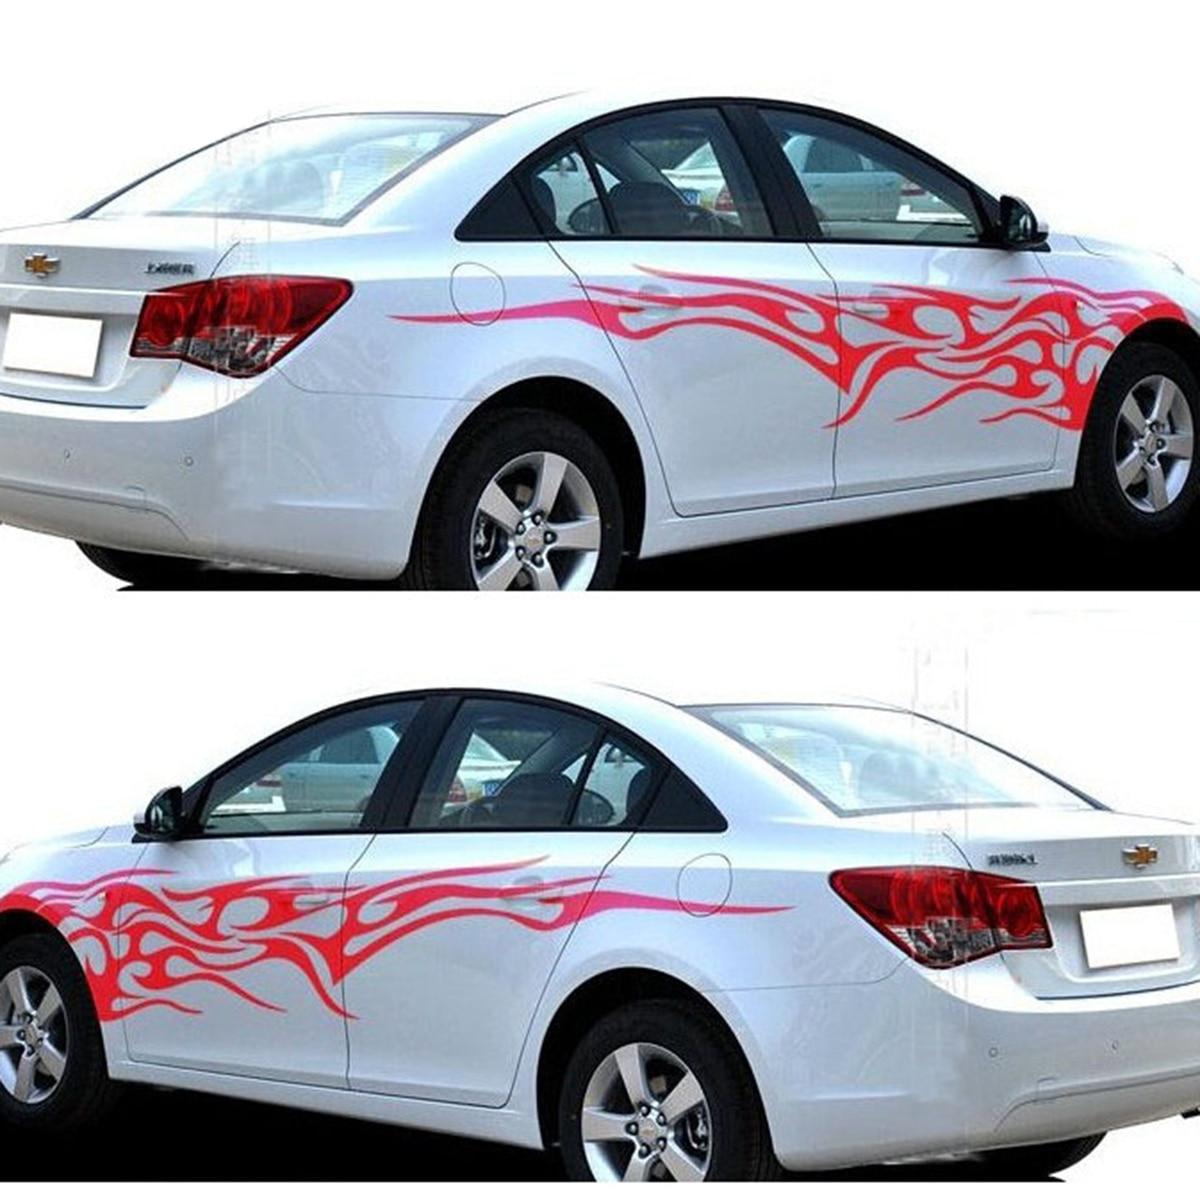 Car full body sticker design - Tribal Flames Graphics Vinyl Tattoos Car Truck Decal Vinyl Graphics Body Vinyl Stickers